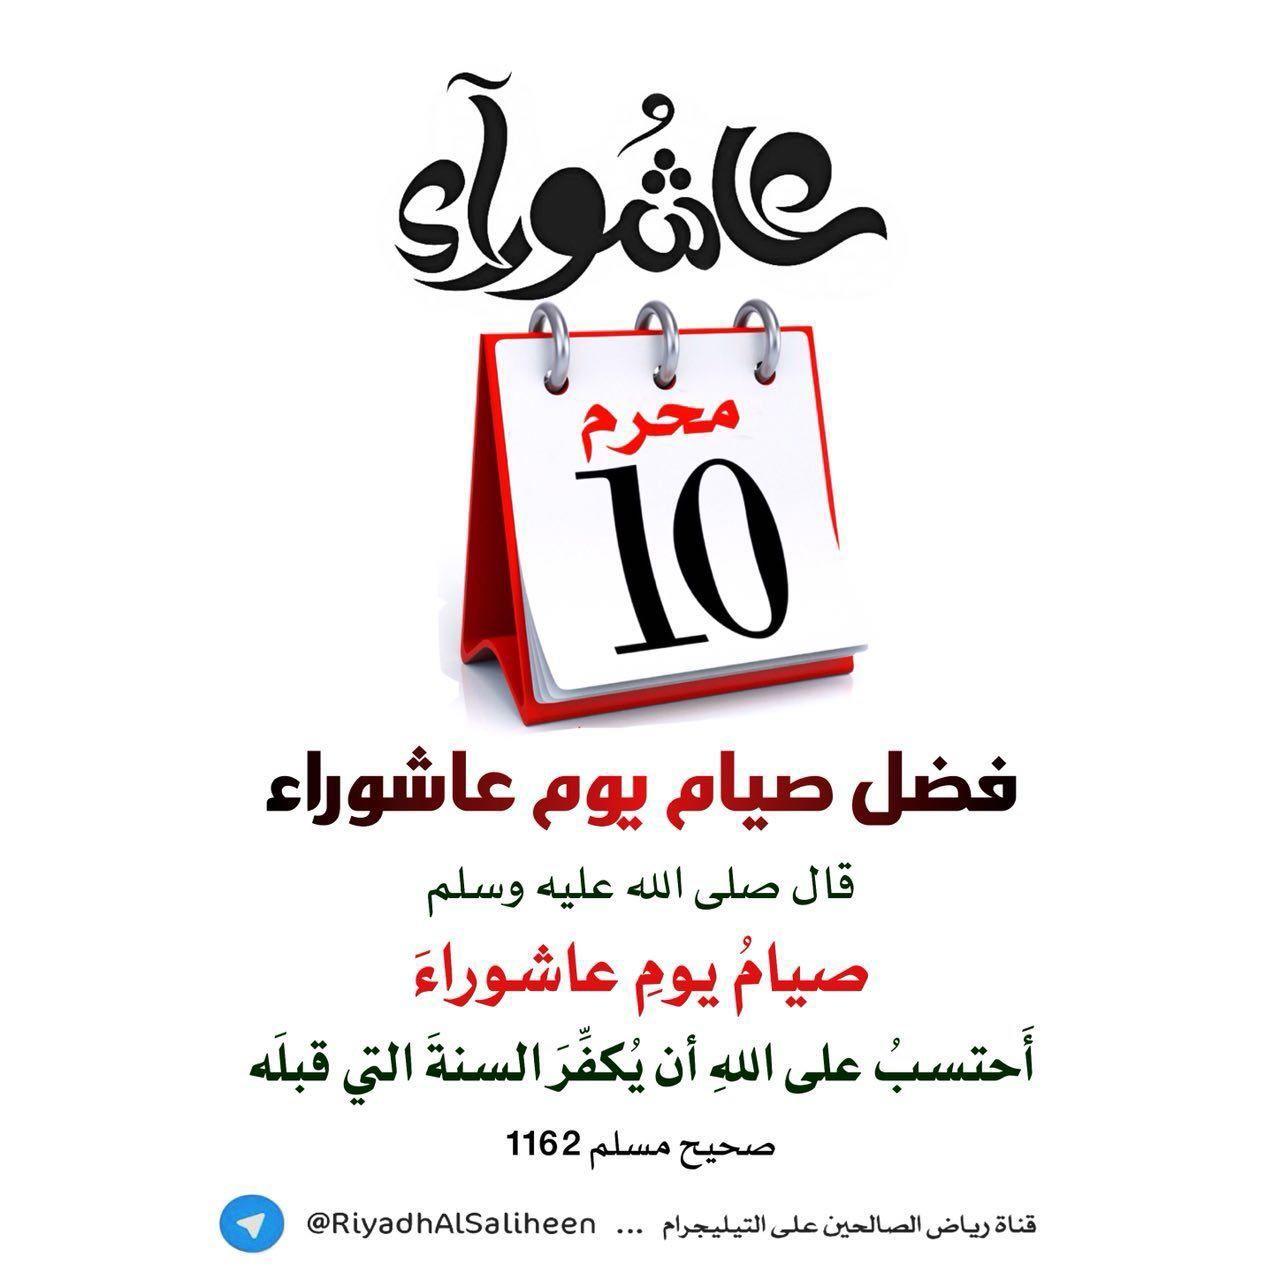 Pin By نشر الخير On أحاديث سيدنا محمد صلى الله عليه وسلم Novelty Sign Wise Novelty